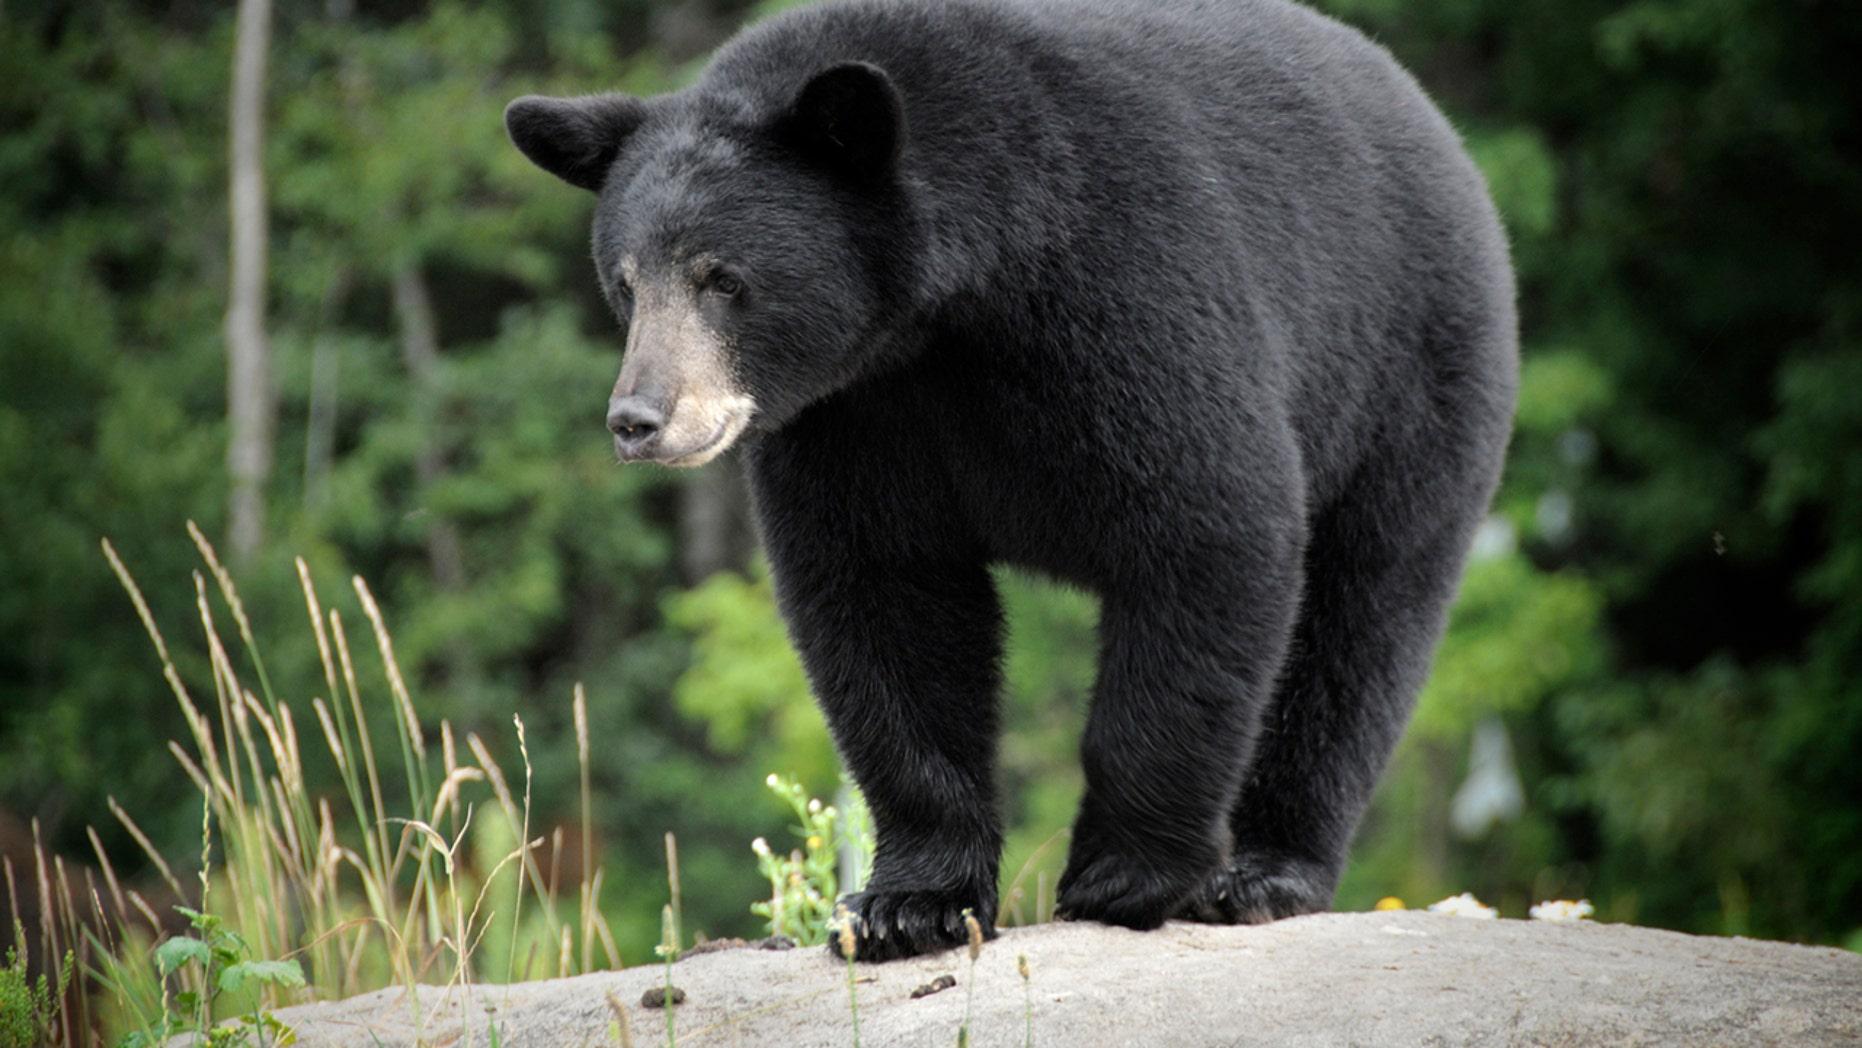 A wild Black Bear. Adobe RGB color profile.